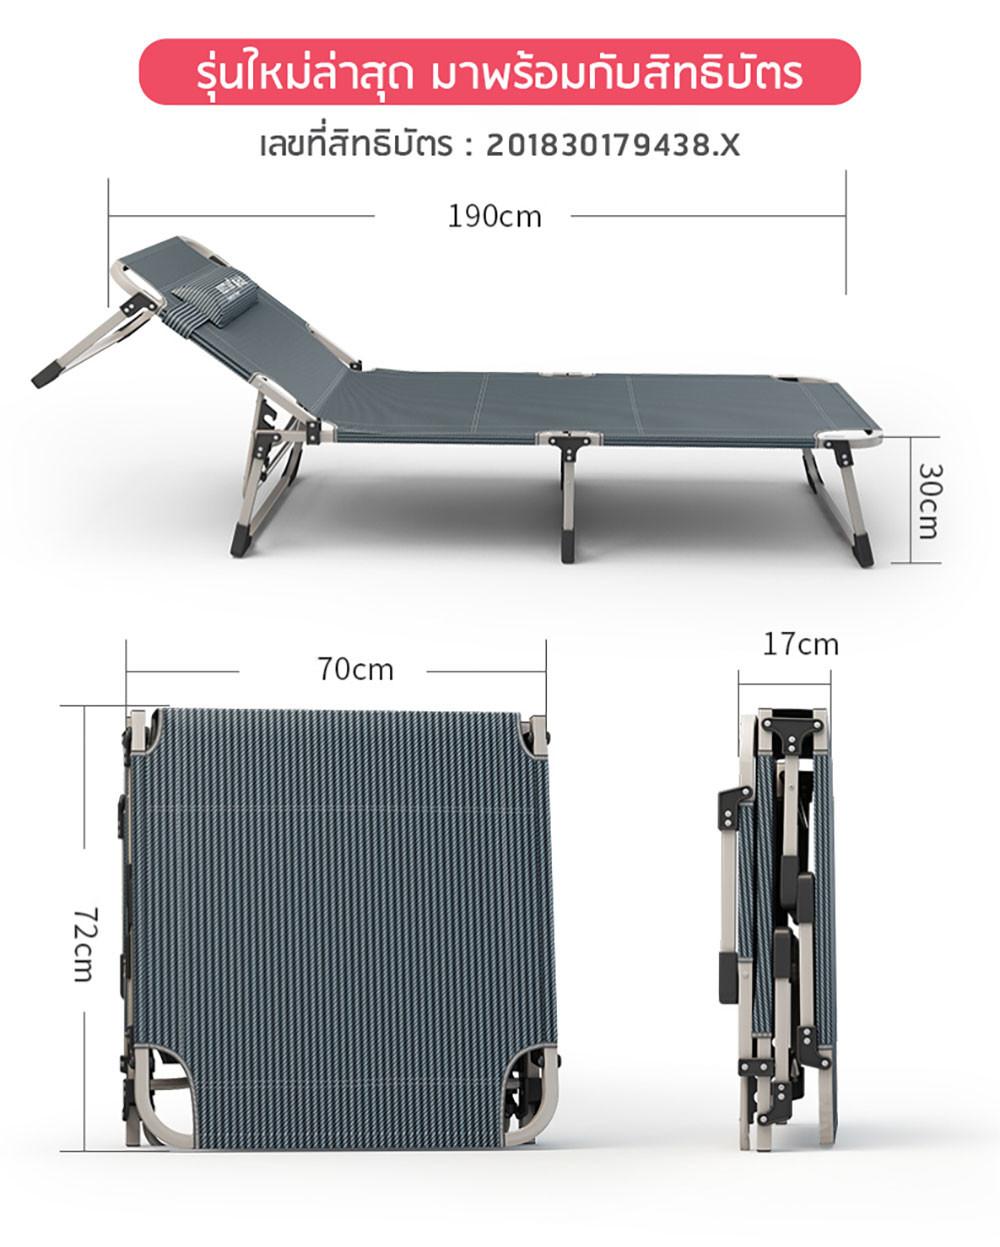 04-fu01-rs14-bk-4g-12.jpg